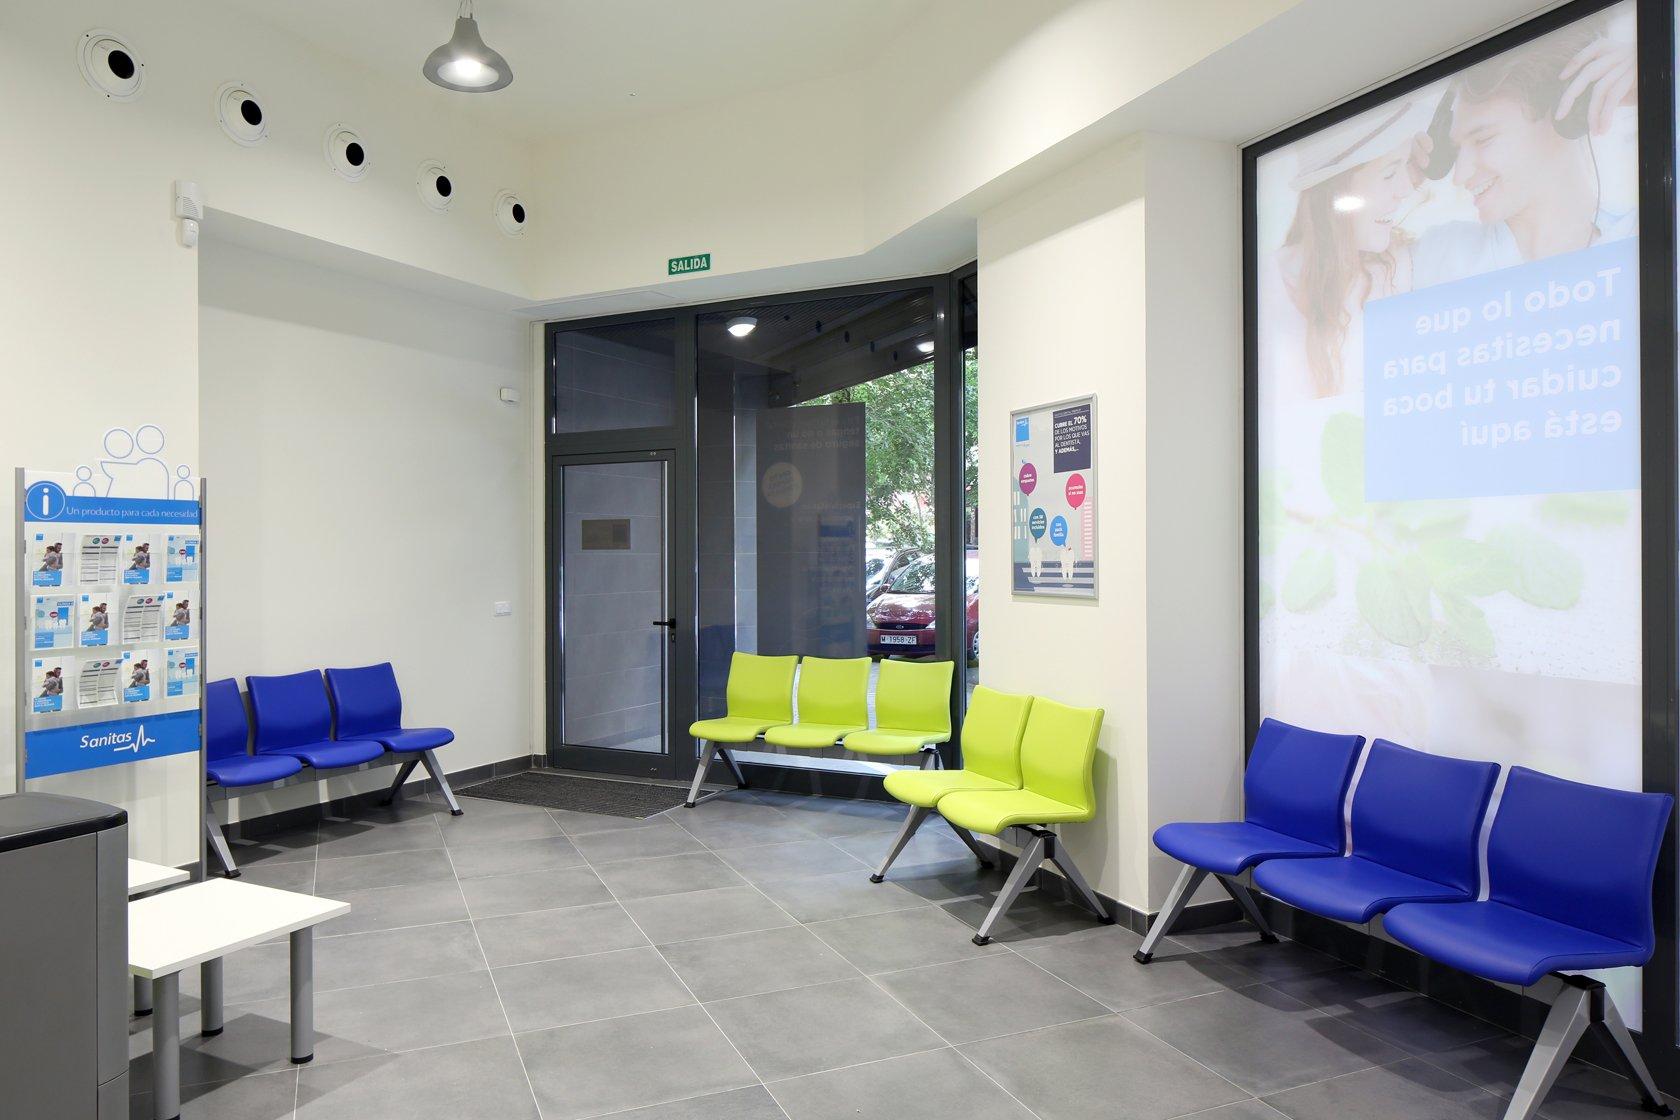 Clinica dental gaztambide dentistas en chamber for Sanitas madrid oficinas